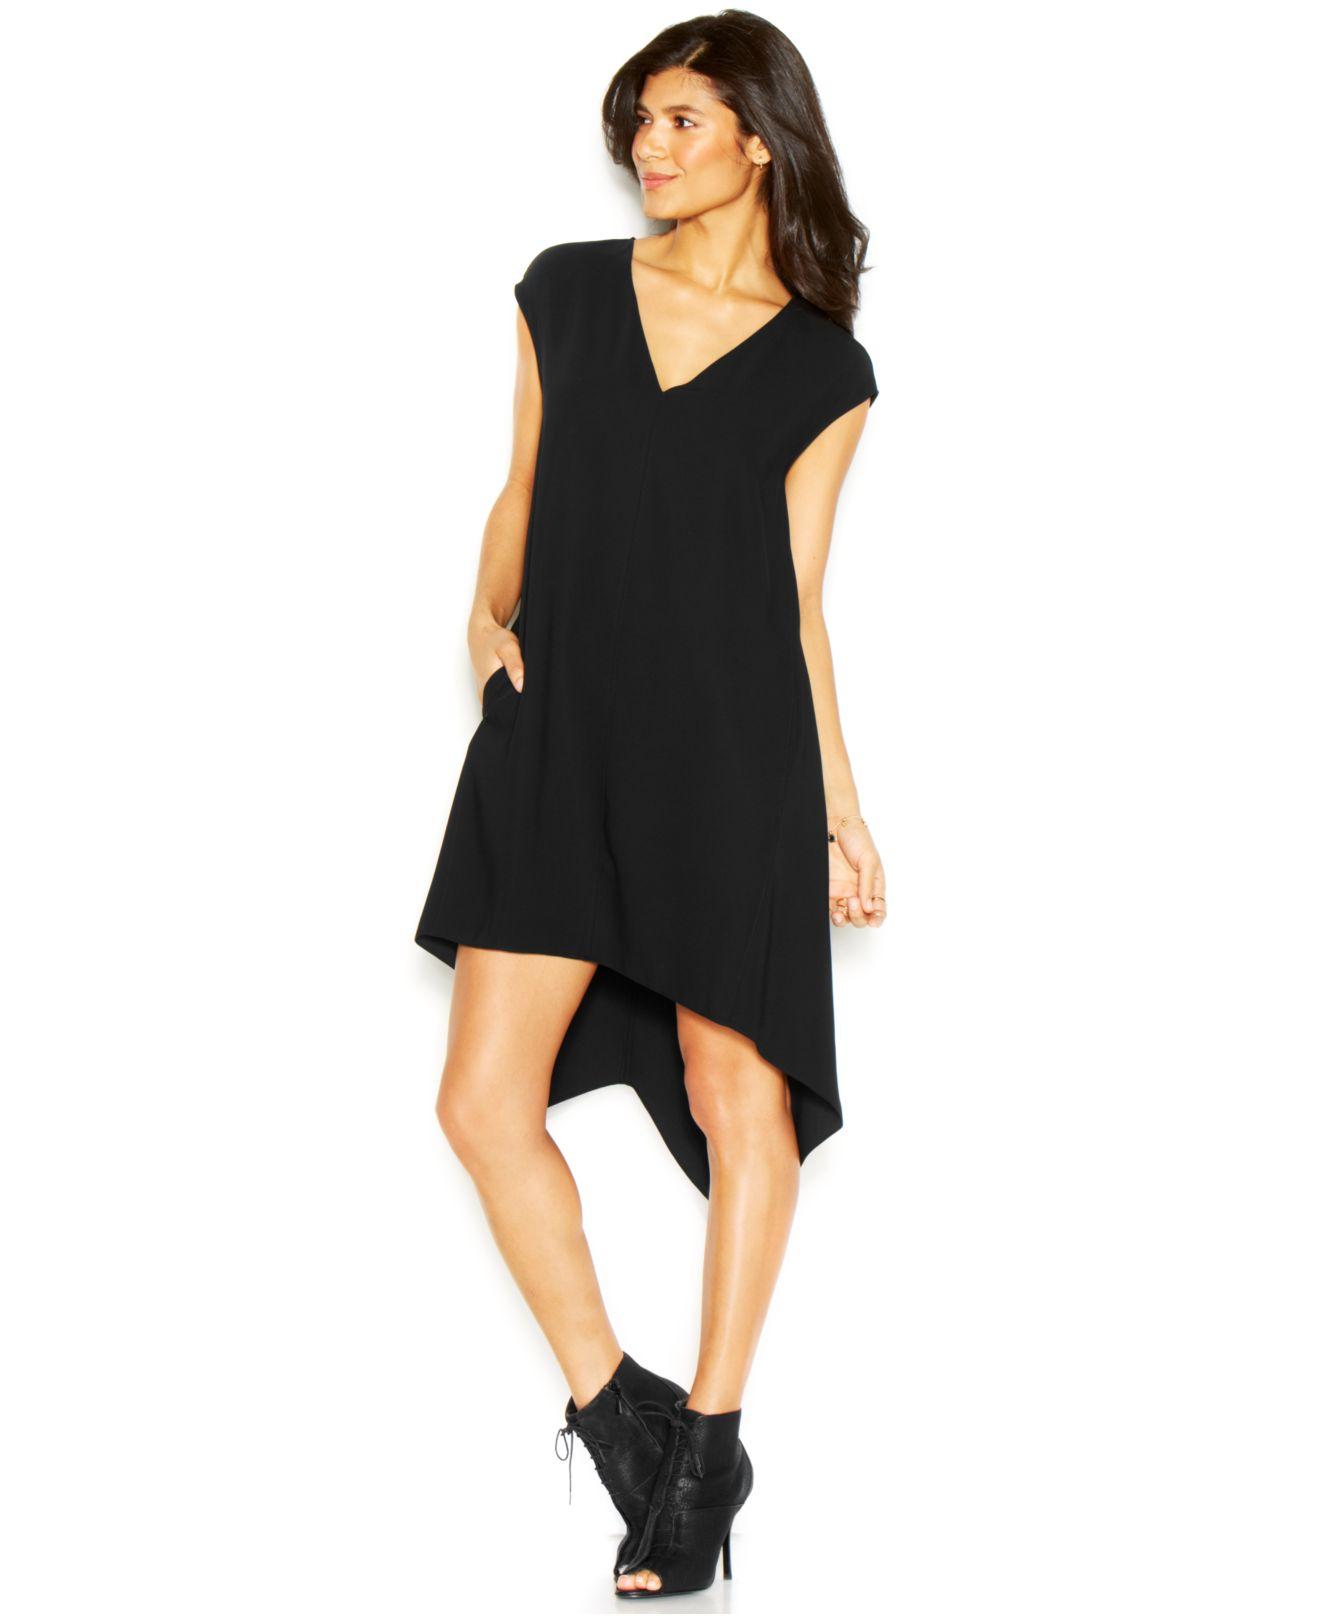 Rachel rachel roy sydney high low dress in black save 25 for Macy black dress wear to wedding